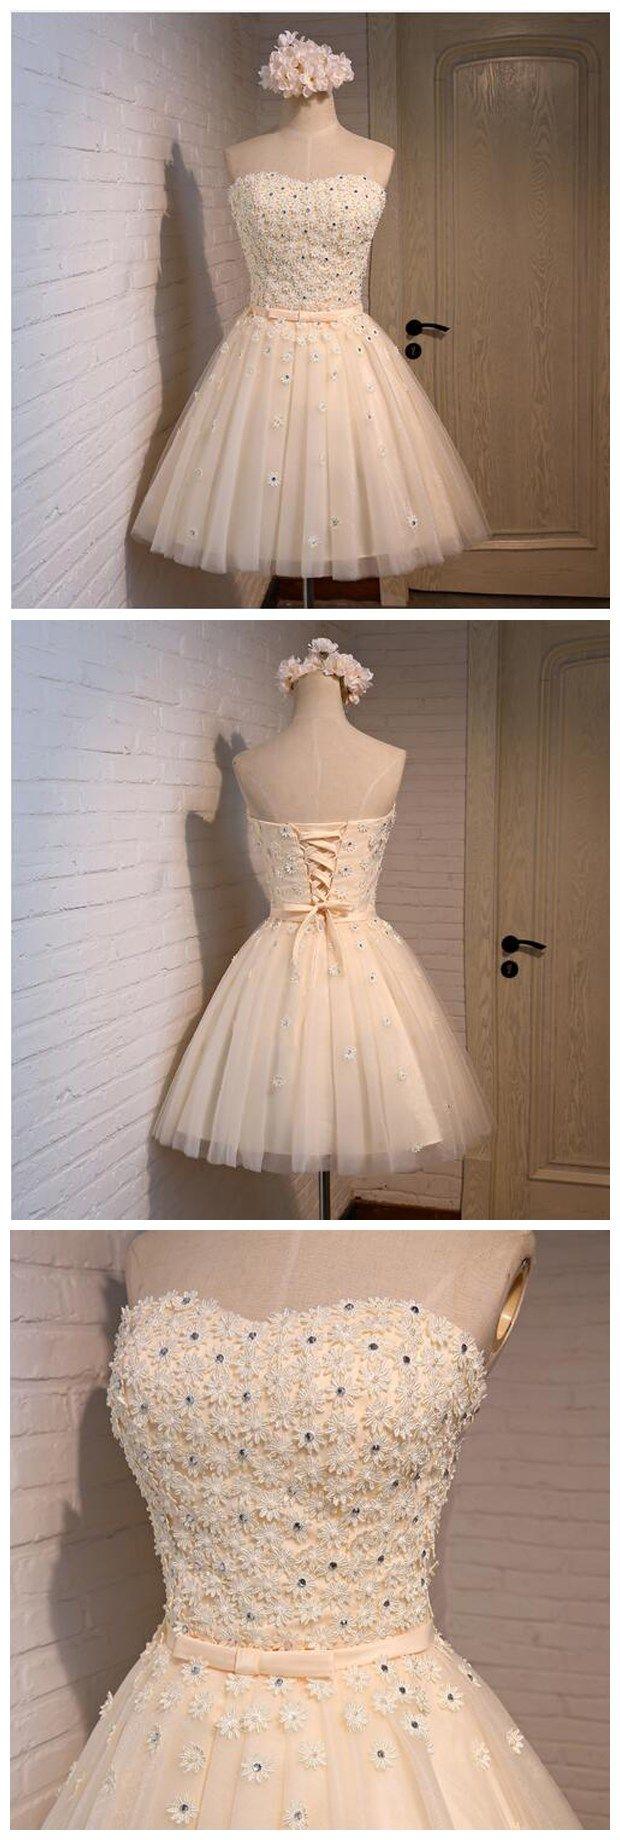 Short Homecoming Dress ,tulle Homec